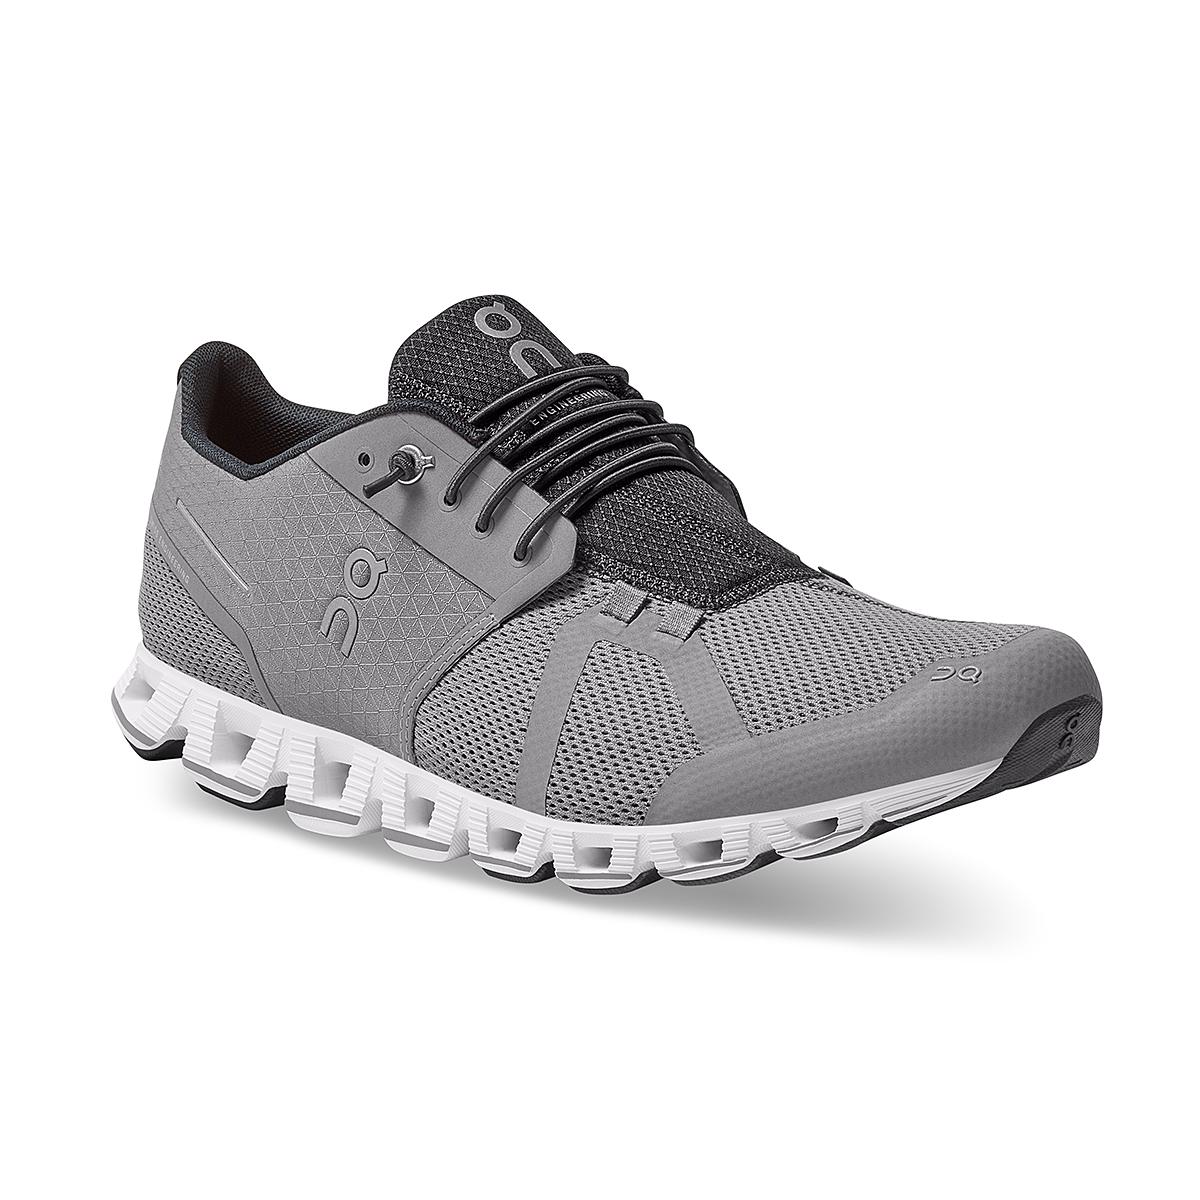 Men's On Cloud Running Shoe - Color: Zinc/White - Size: 7 - Width: Regular, Zinc/White, large, image 2